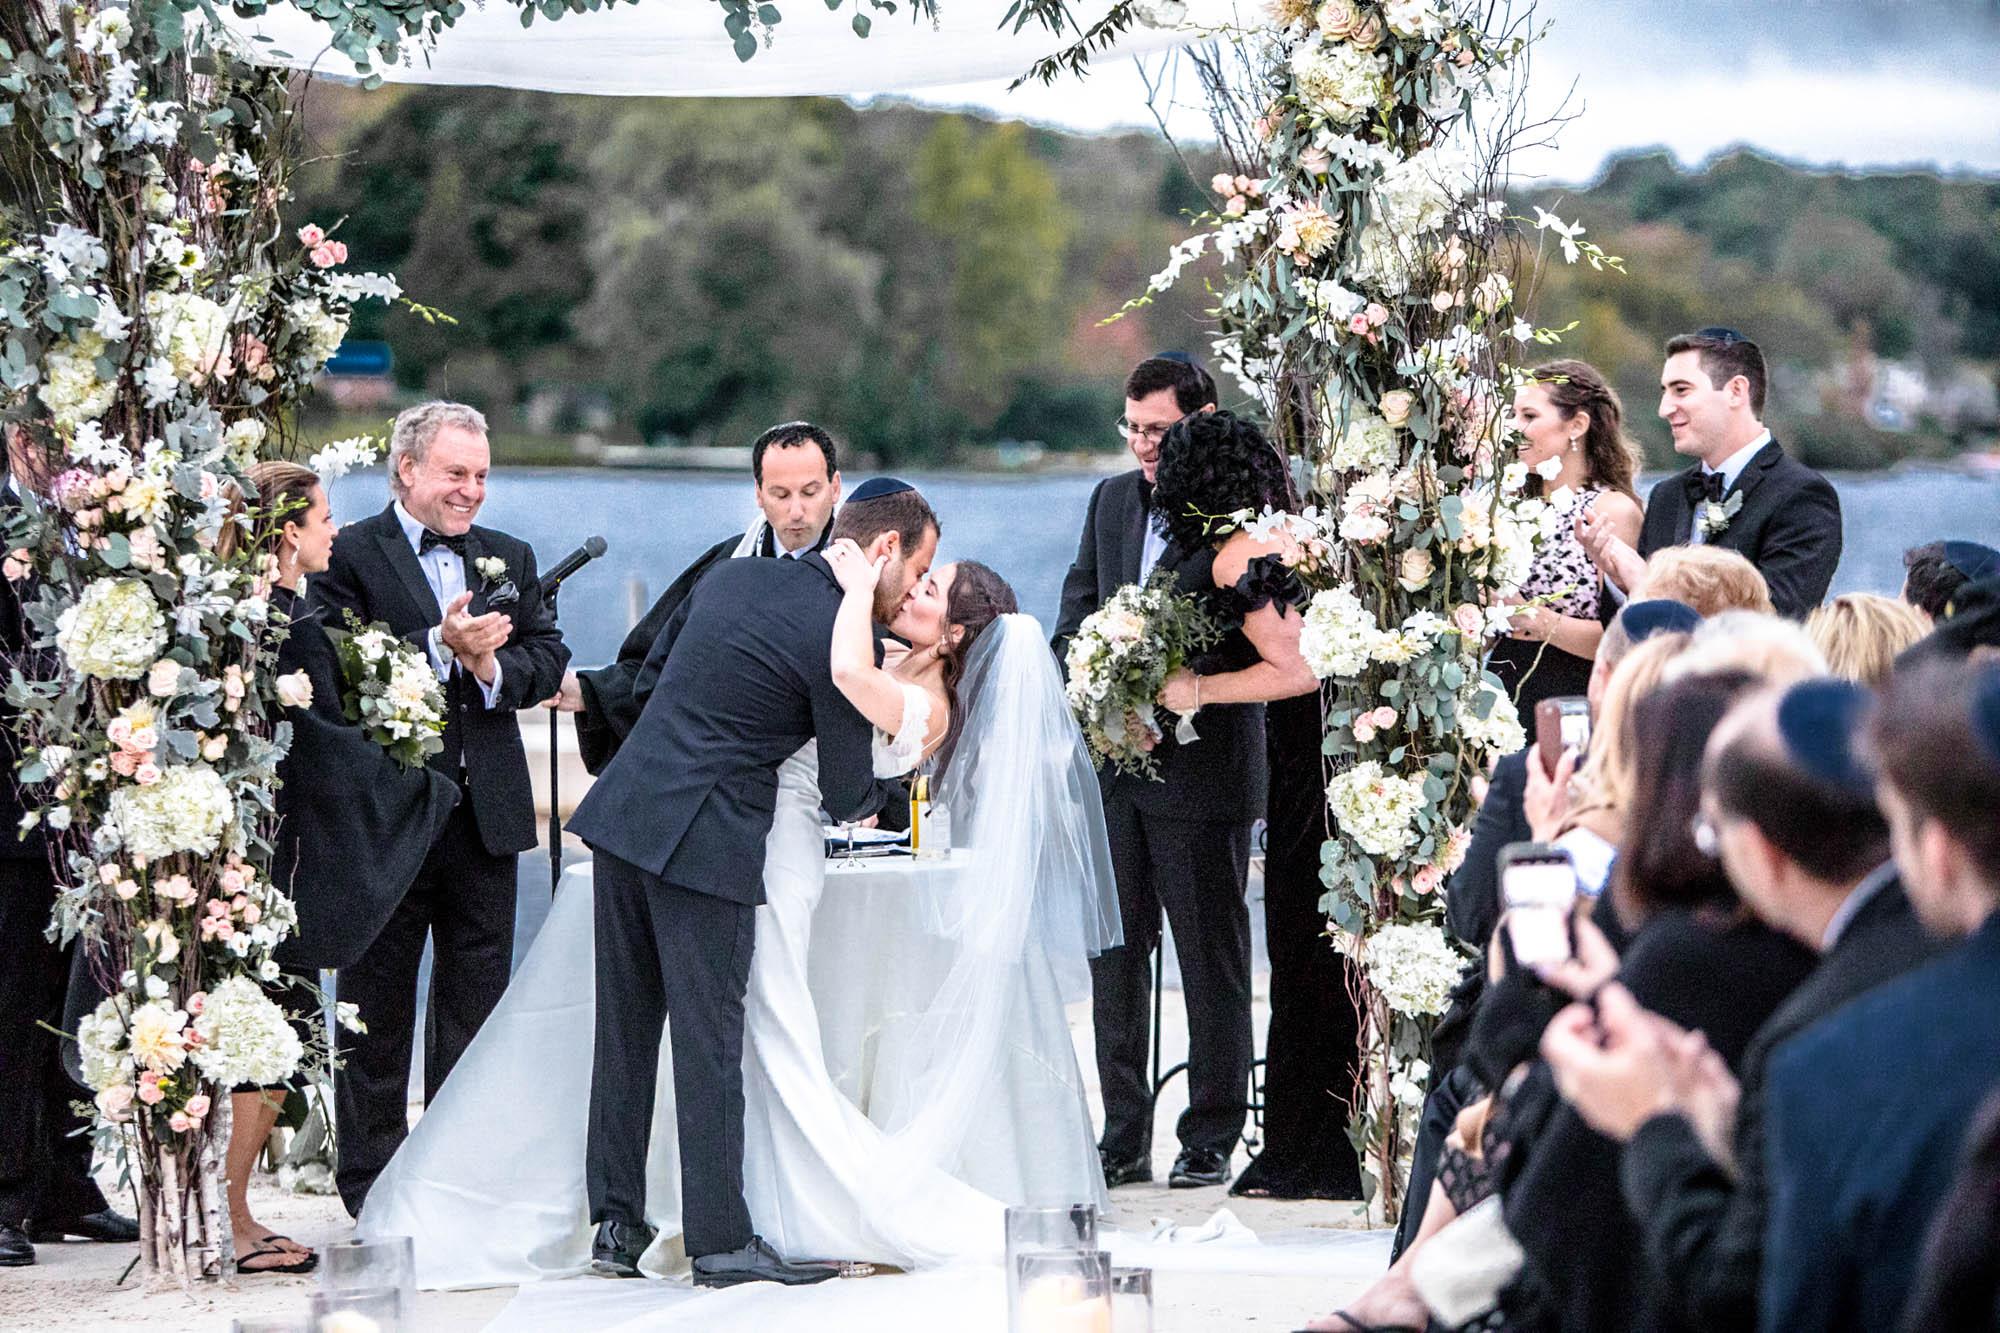 scranton_wedding_photographer_lettieri_pa (29 of 34).jpg